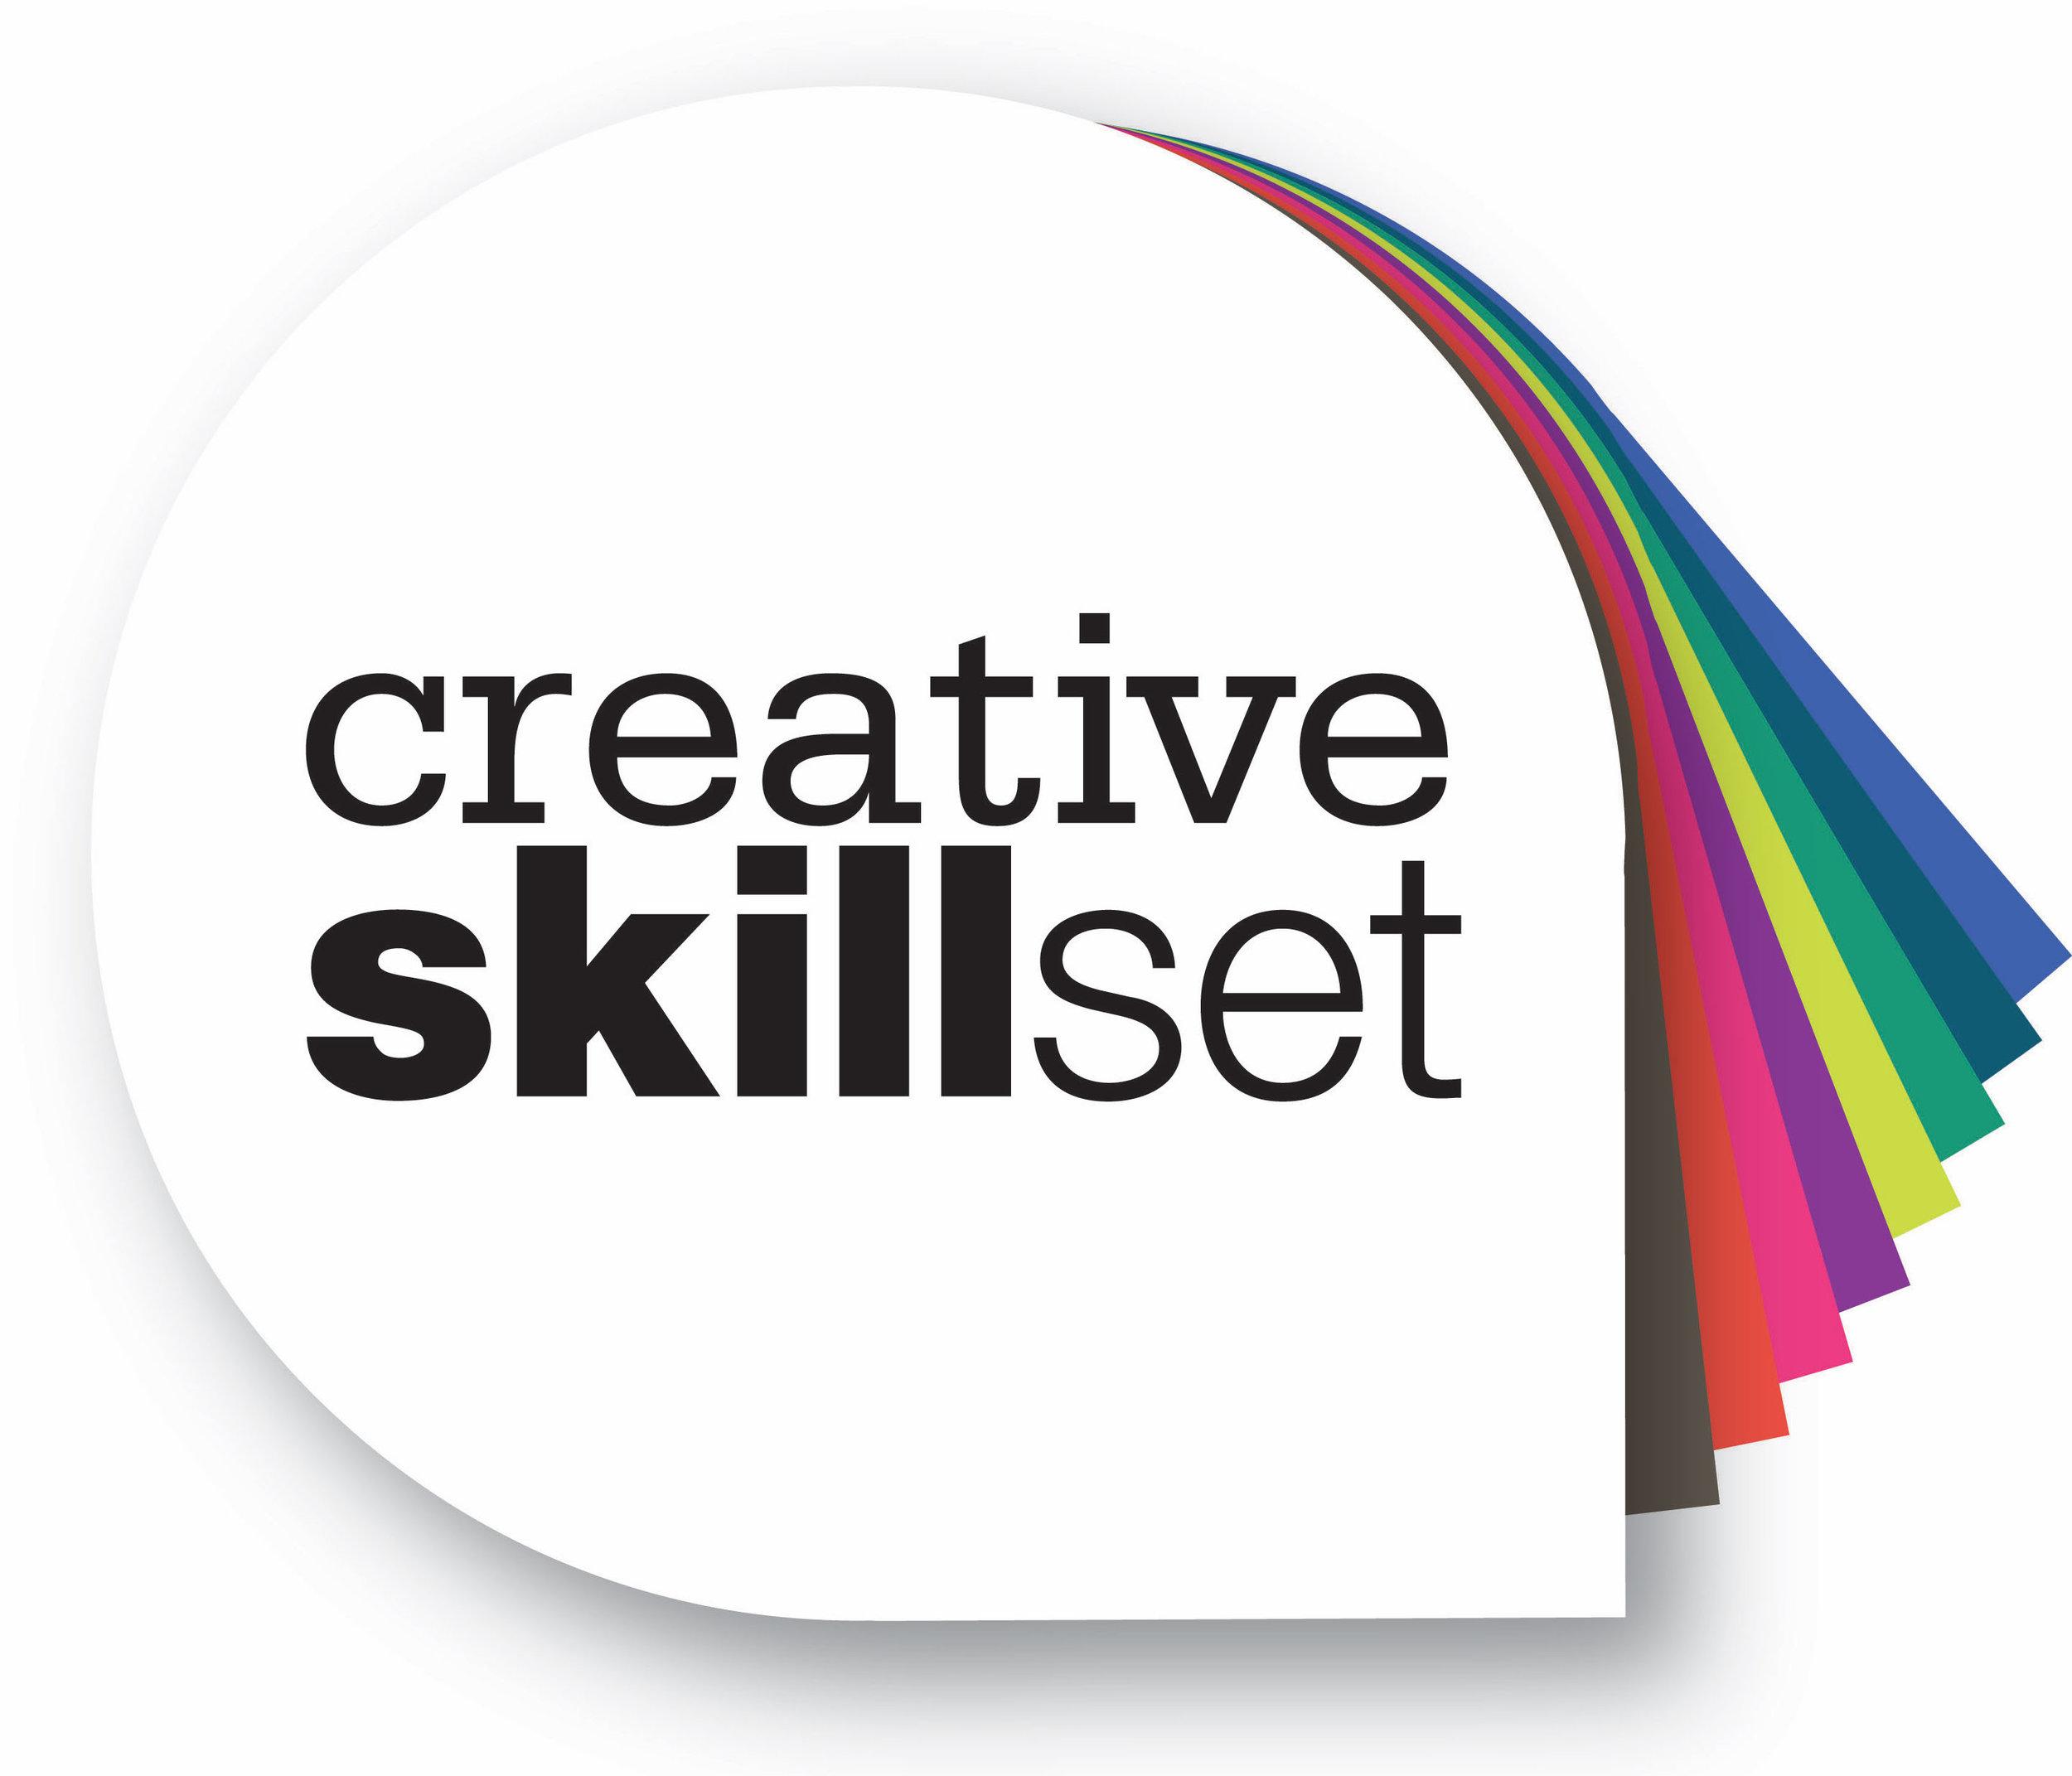 creative skillset high end tv drama skills levy the rough assembly